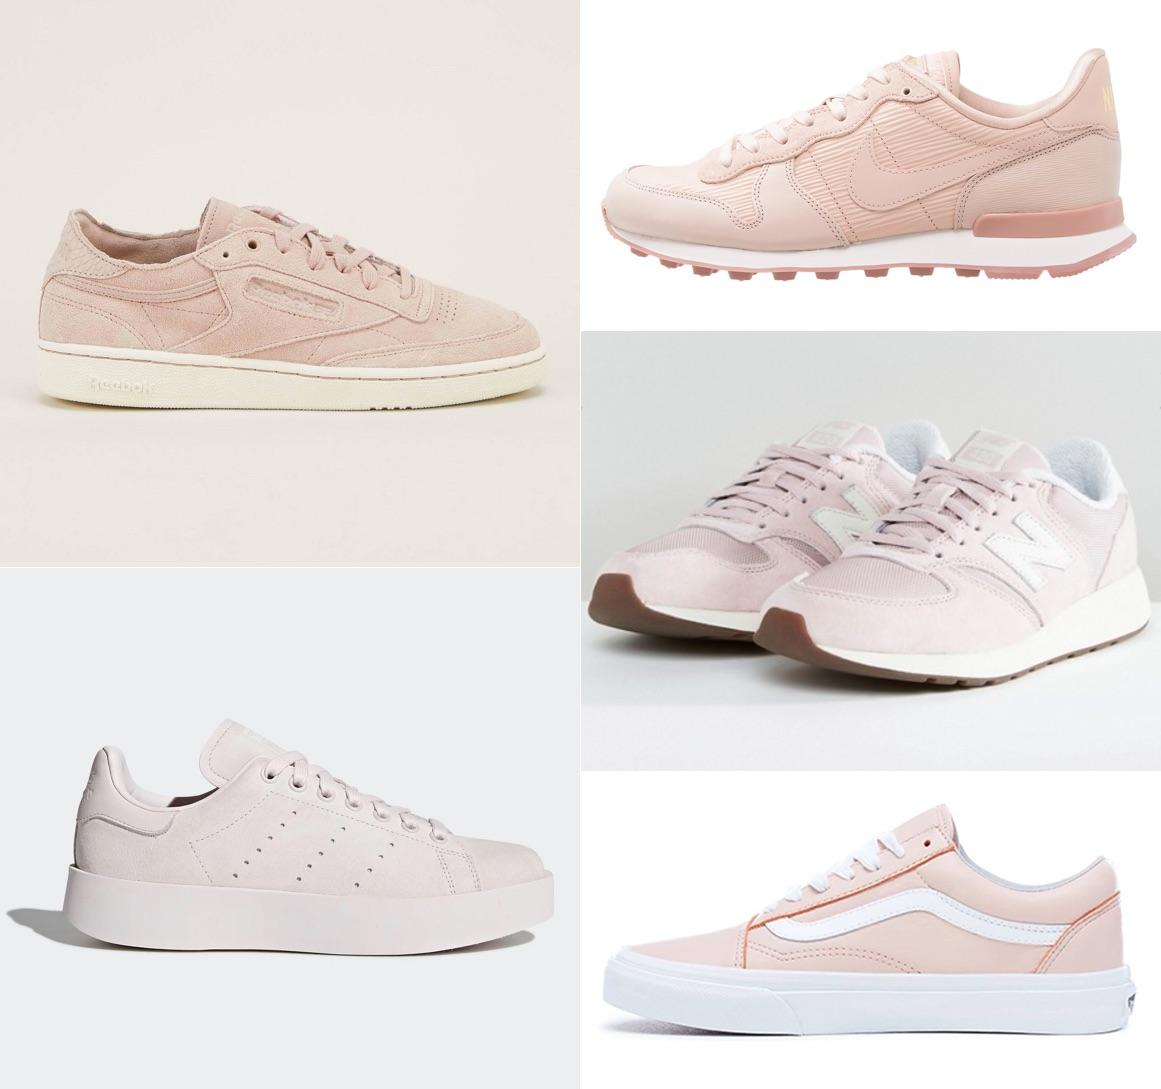 Baskets roses Adidas New Balance Nike Reebok Vans